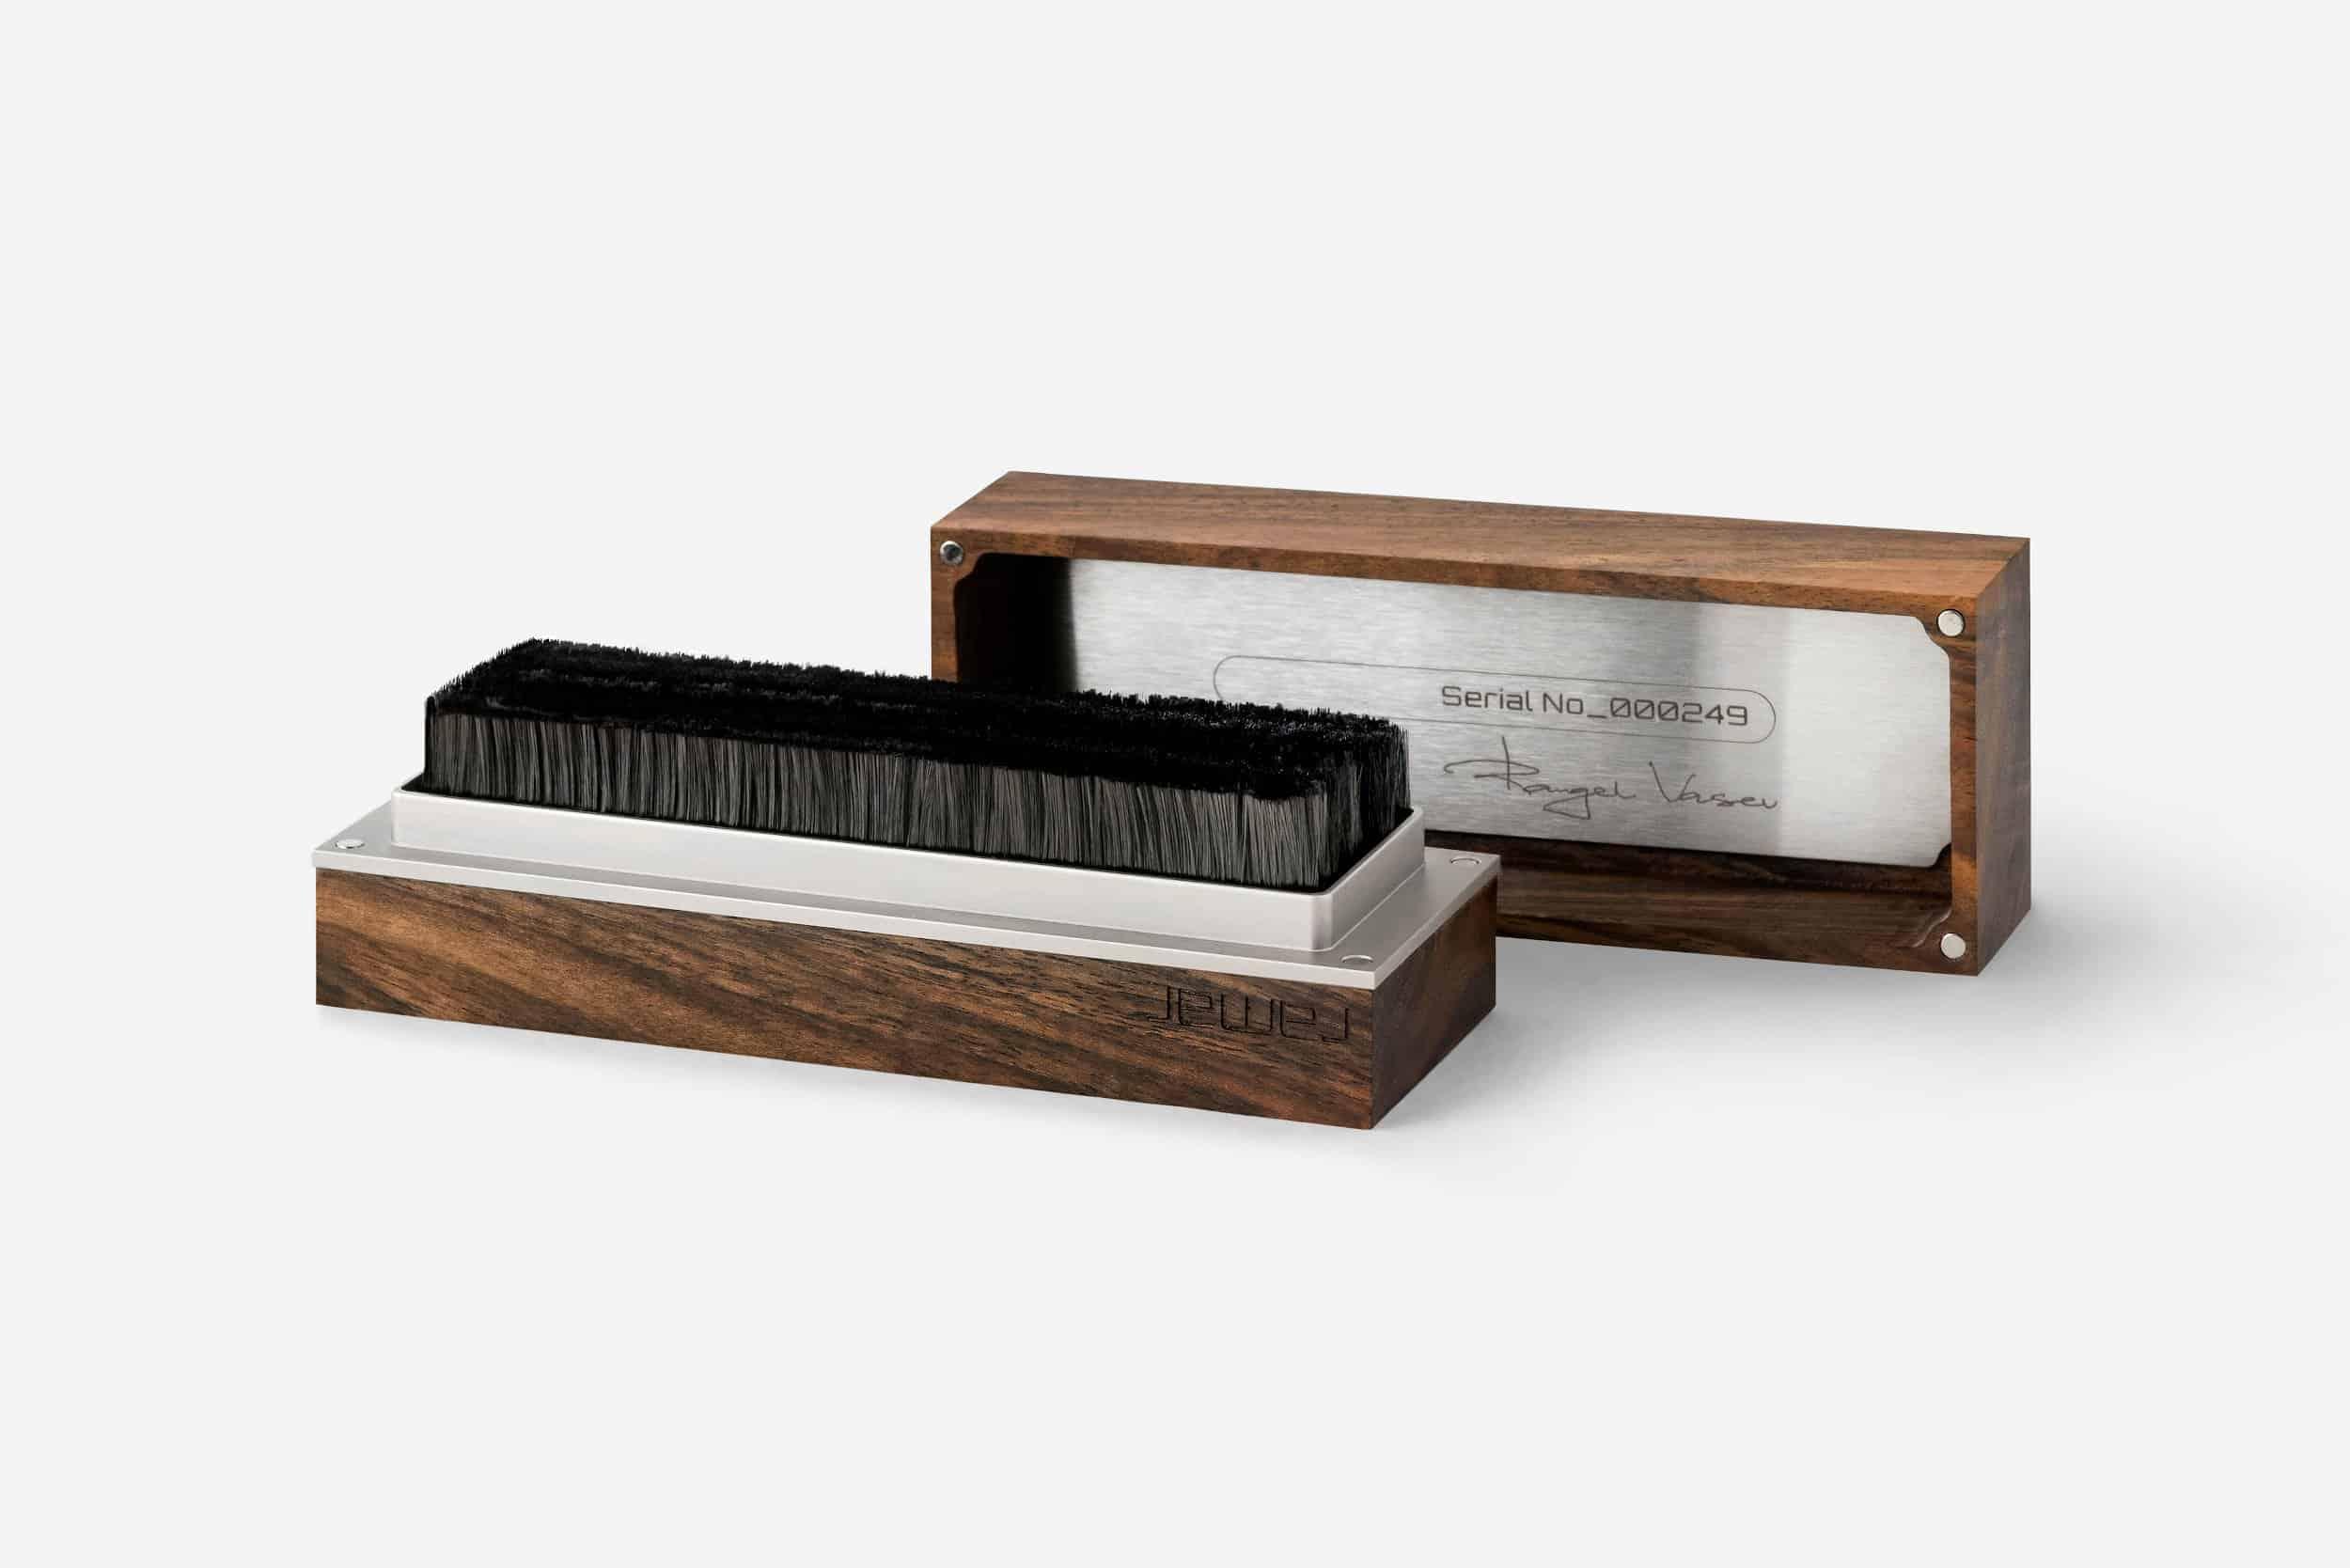 The handmade record brush Tina from ramar is opened. Record brush.